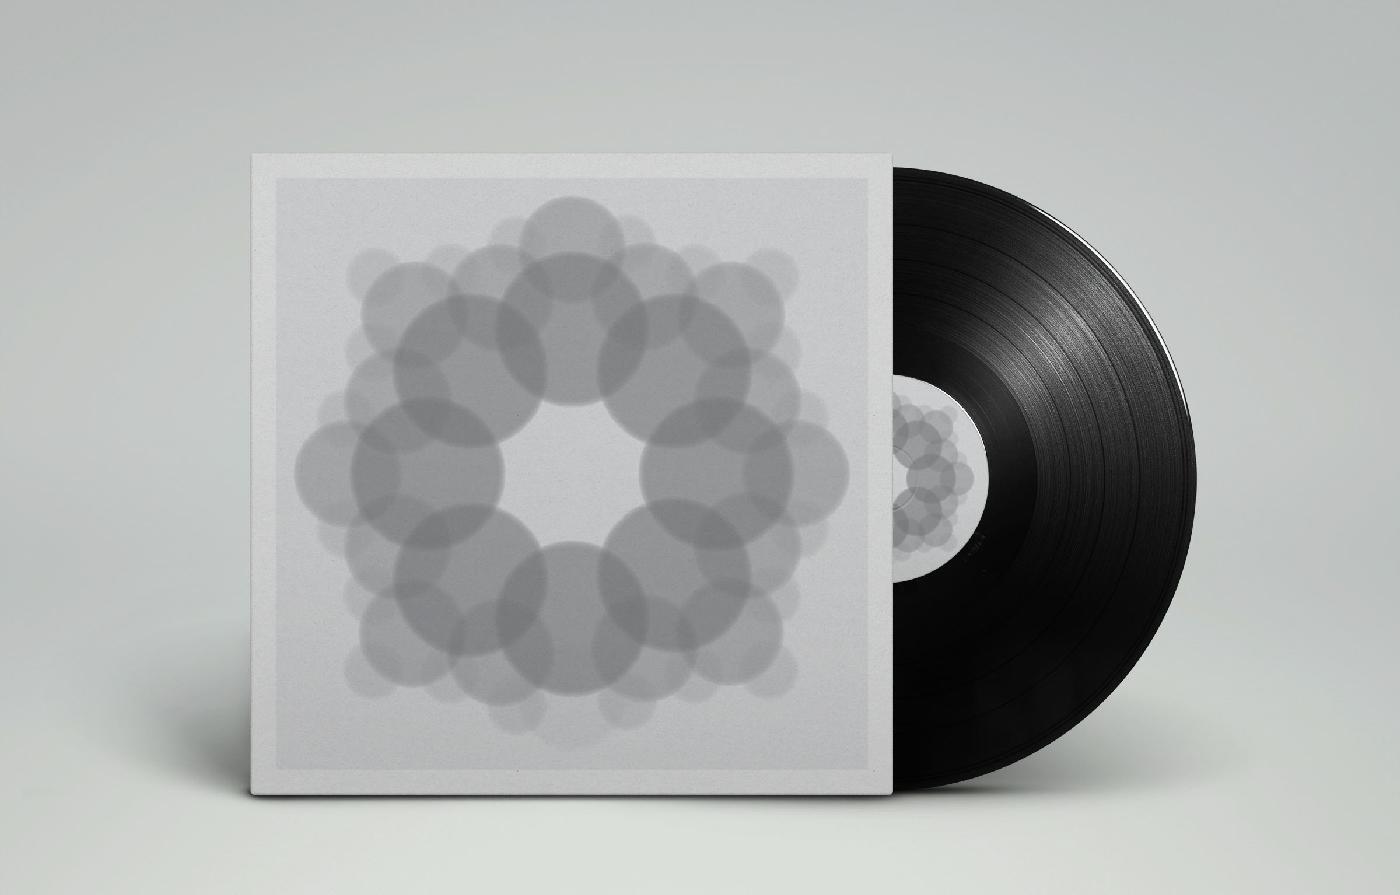 Max Richter - Dream 3 - sleeve 3